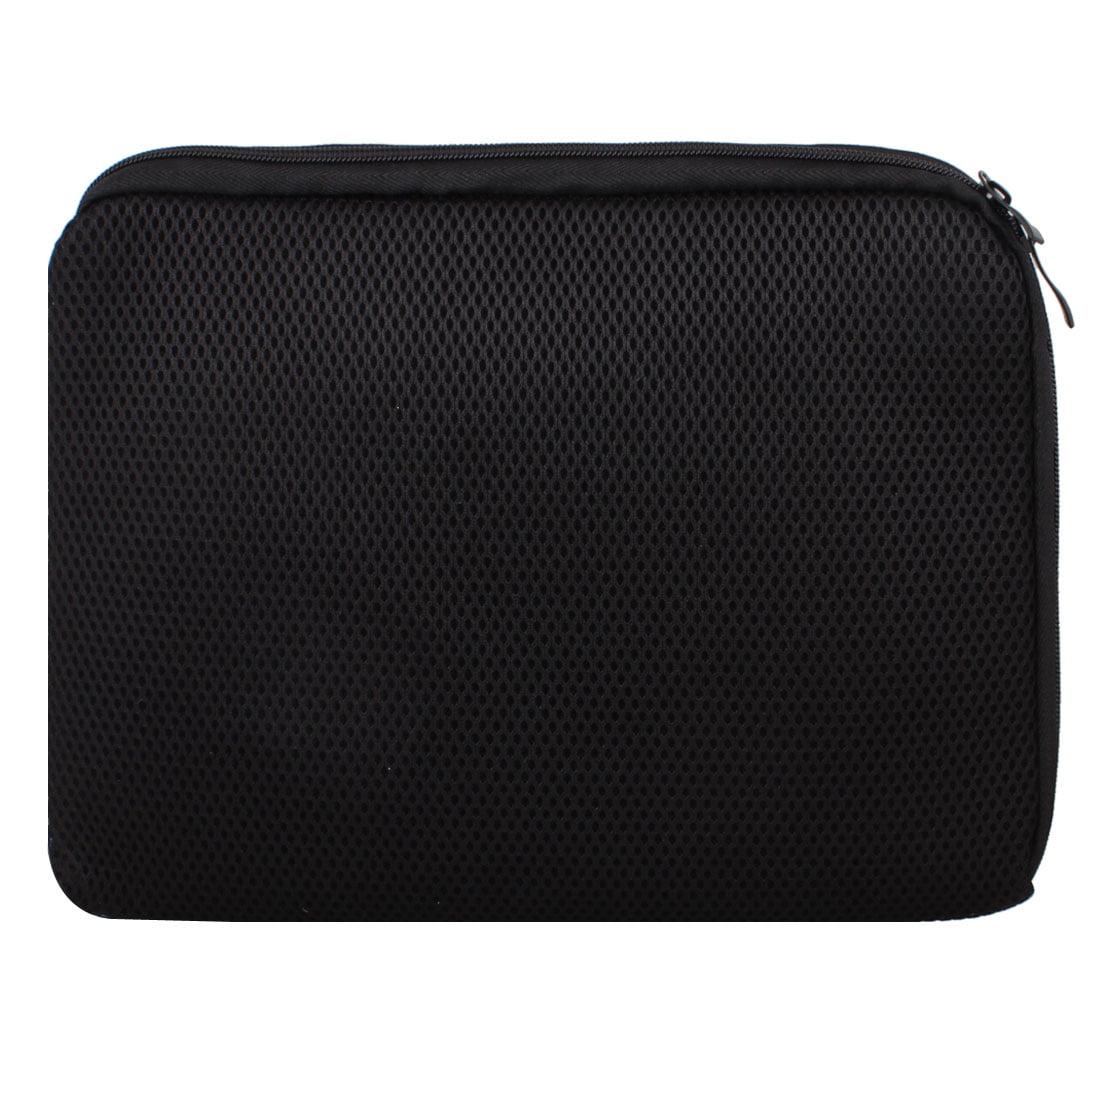 "11.6"",12"",12.1"",12.4"" Shockproof Notebook Laptop Sleeve for HP Black"